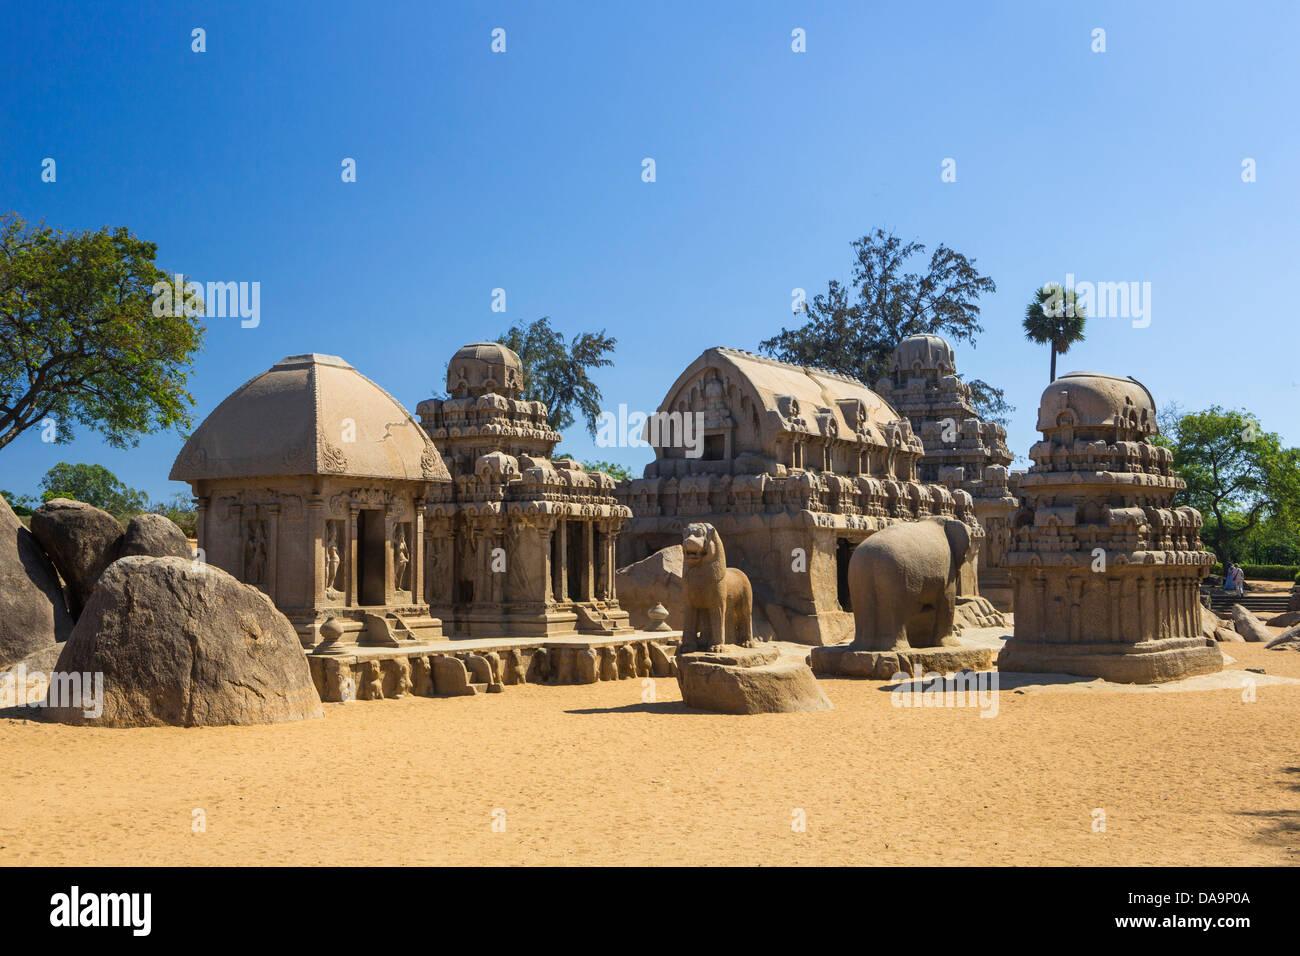 India, South India, Asia, Tamil Nadu, Mamallapuram, Mahabalipuram, Rathas, Five Rathas, rock-cut, architecture, - Stock Image